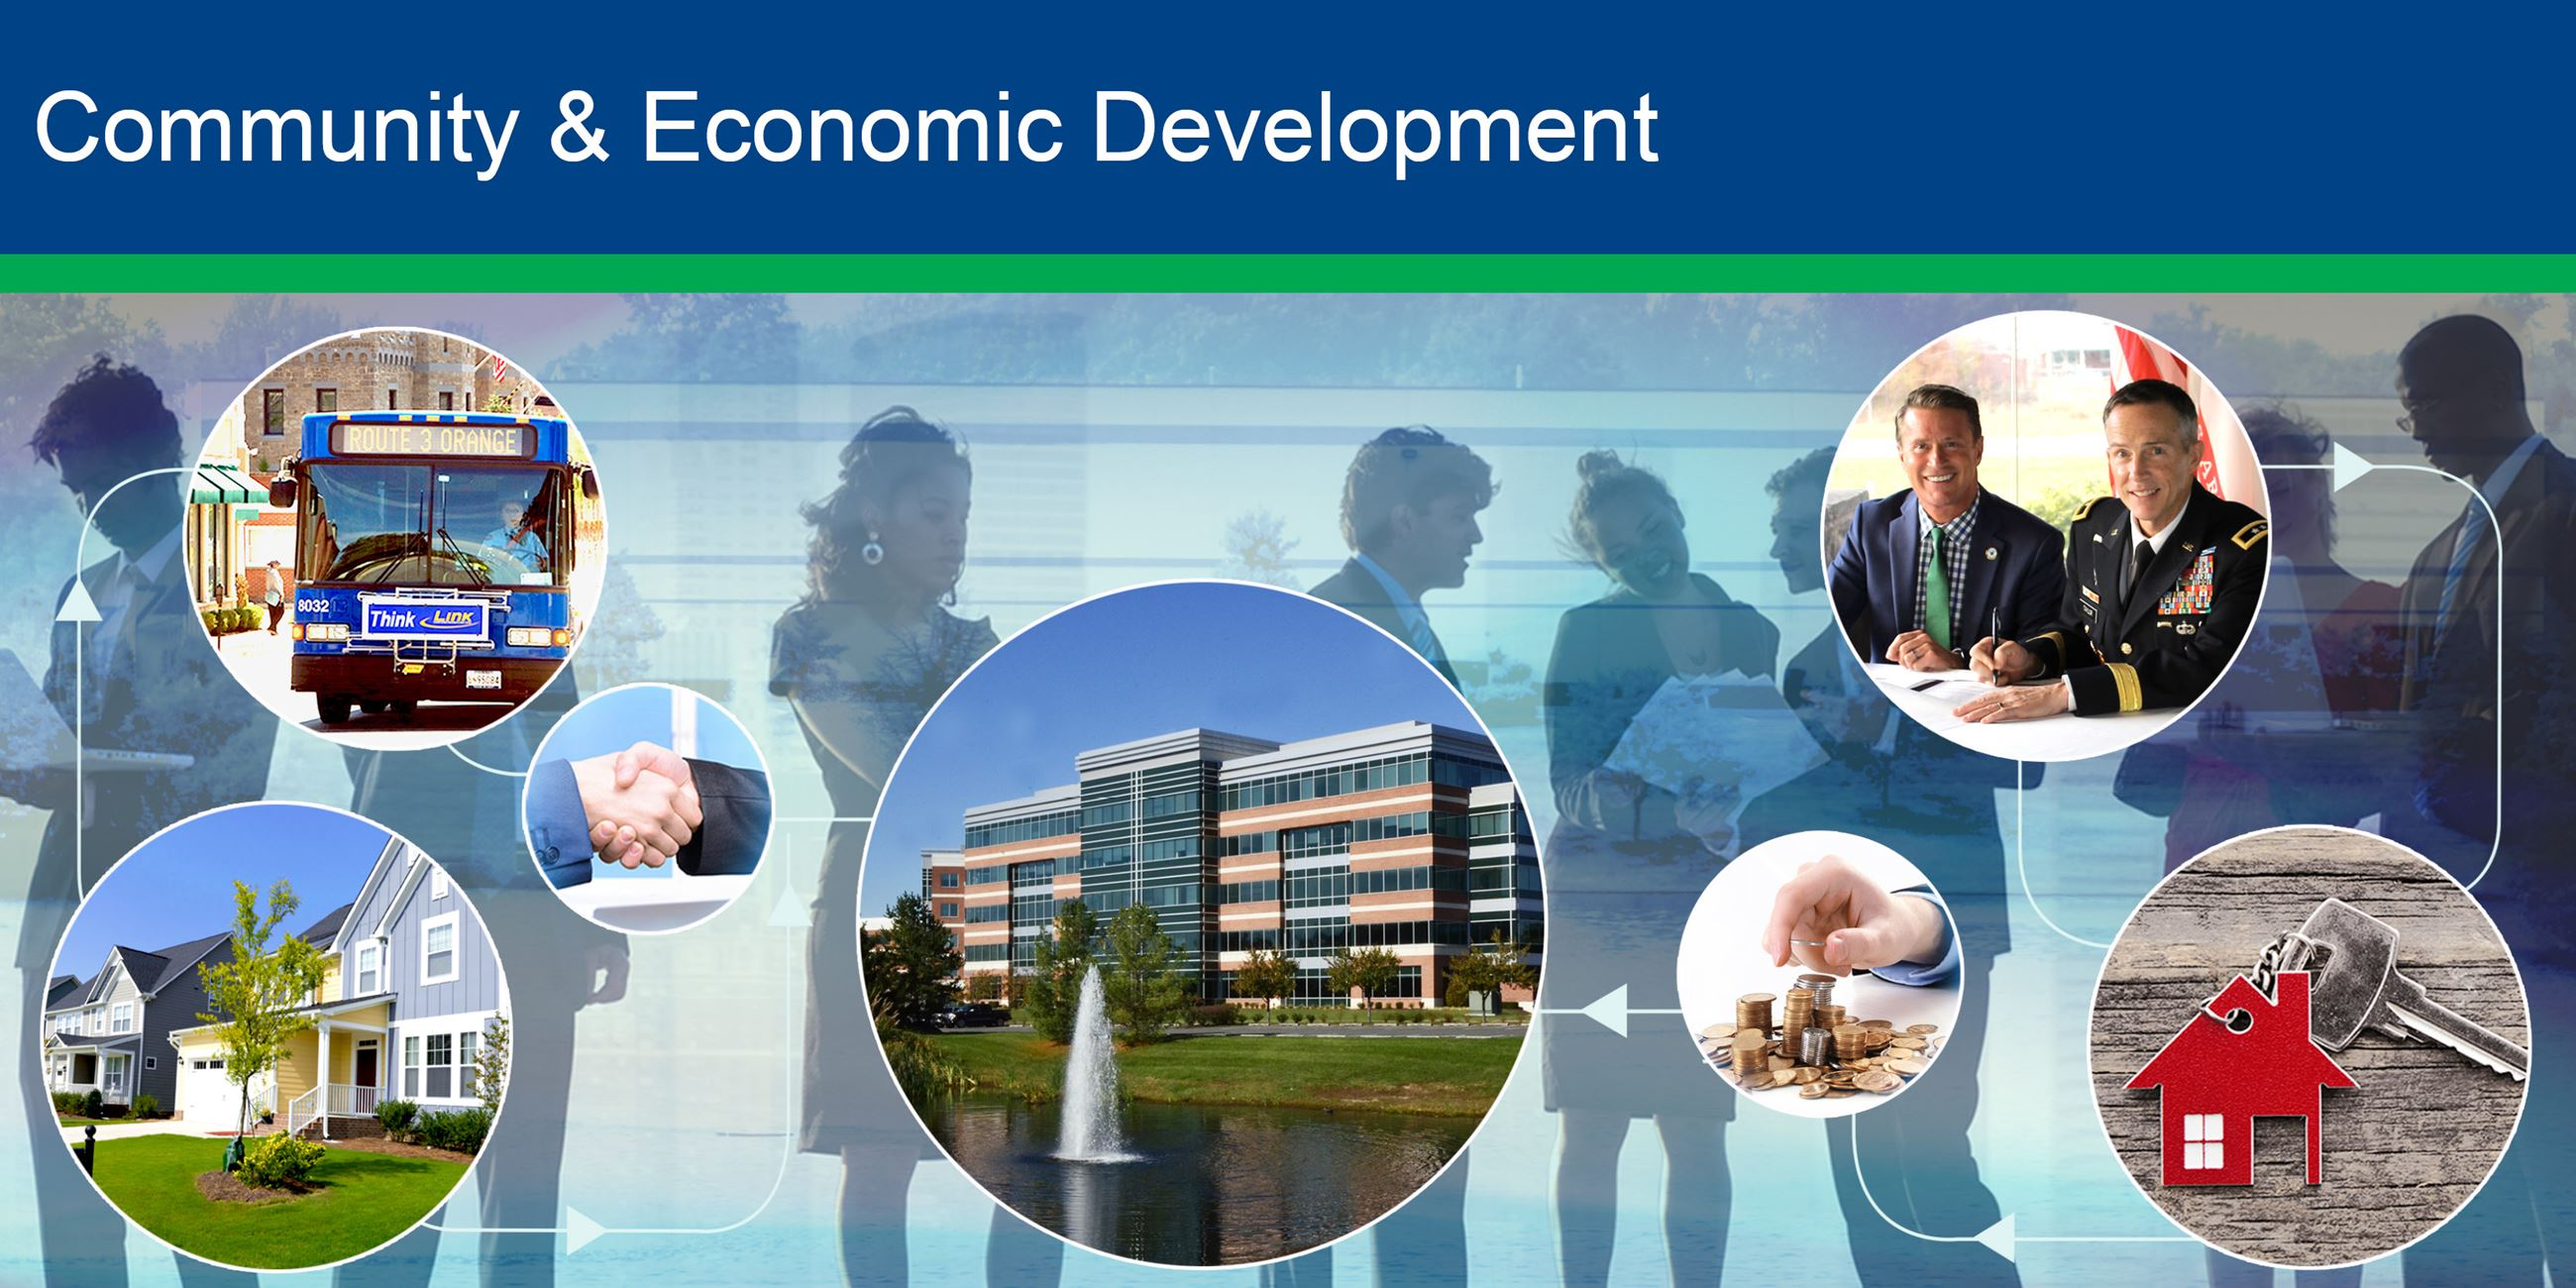 Community & Economic Development | Harford County, MD